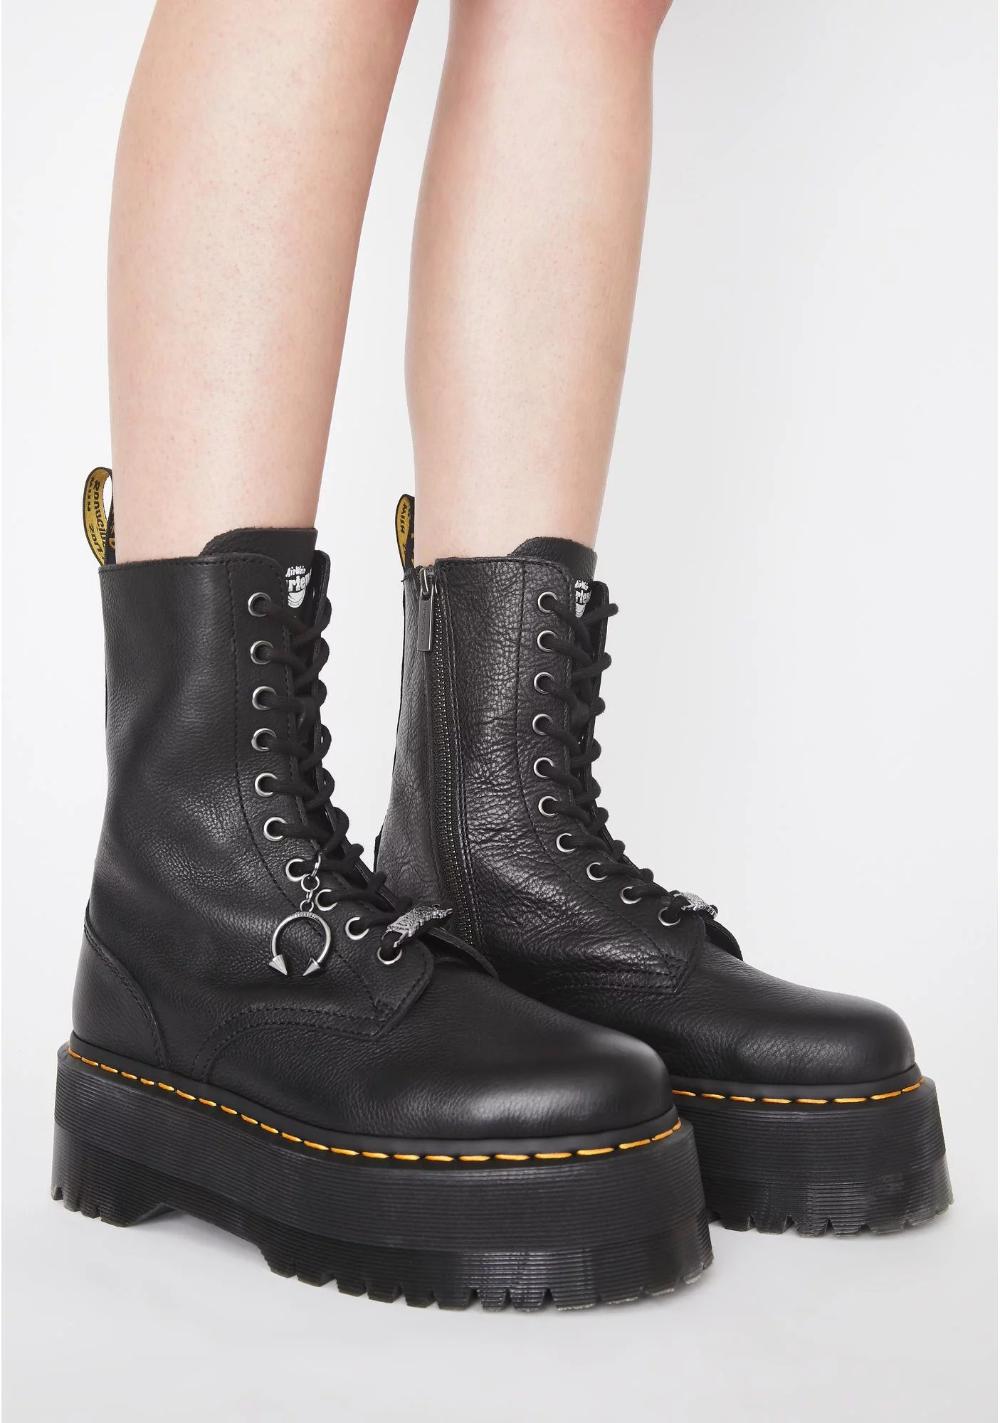 Dr Martens Laceup Boots « Fash Eccentric!: Singapore Fashion